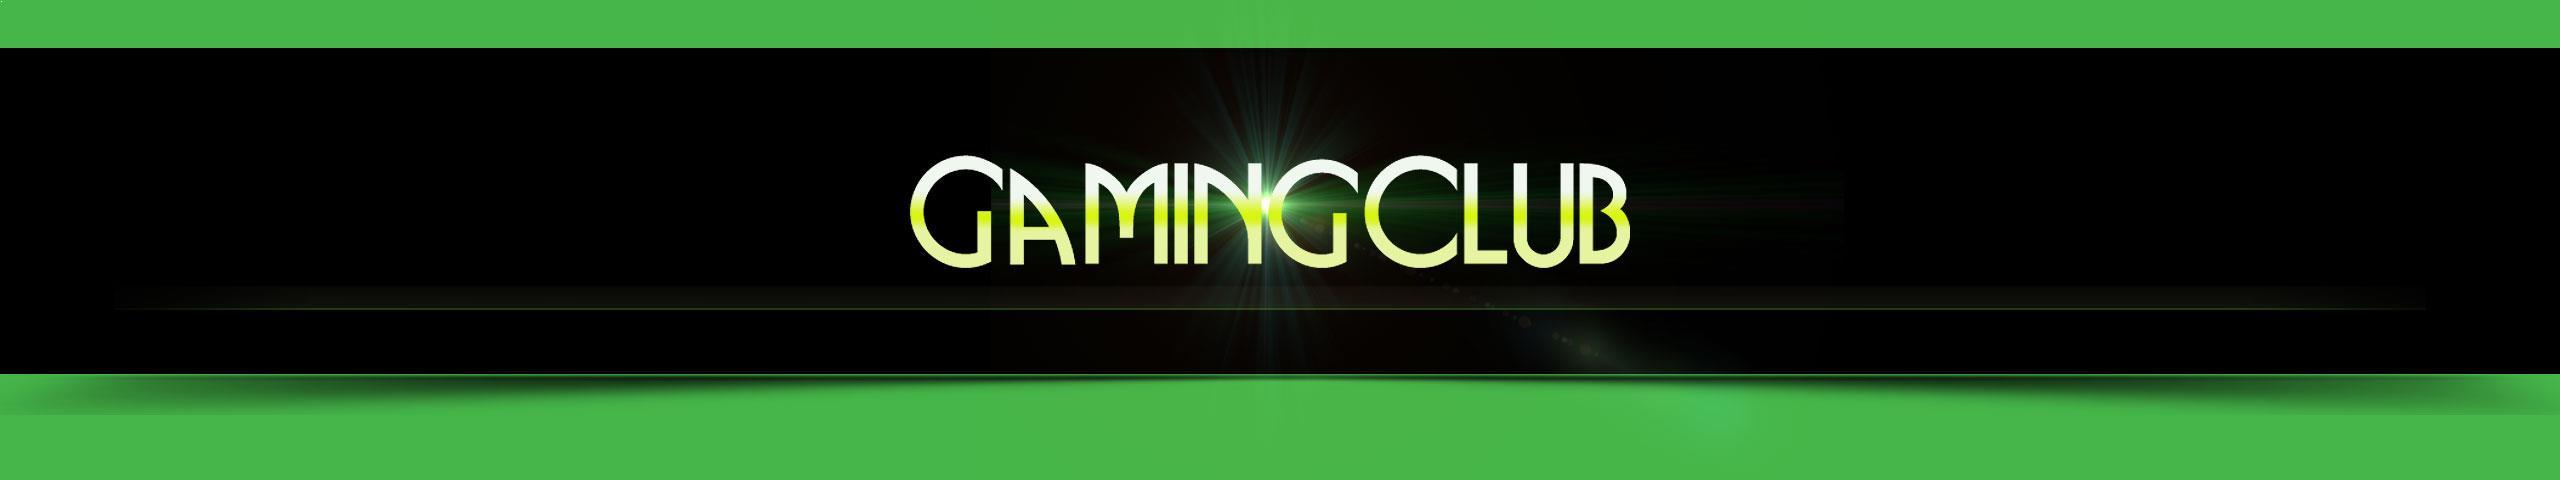 GamingClub Vizualizarea Casino-ului Casino Multa Bafta Slider